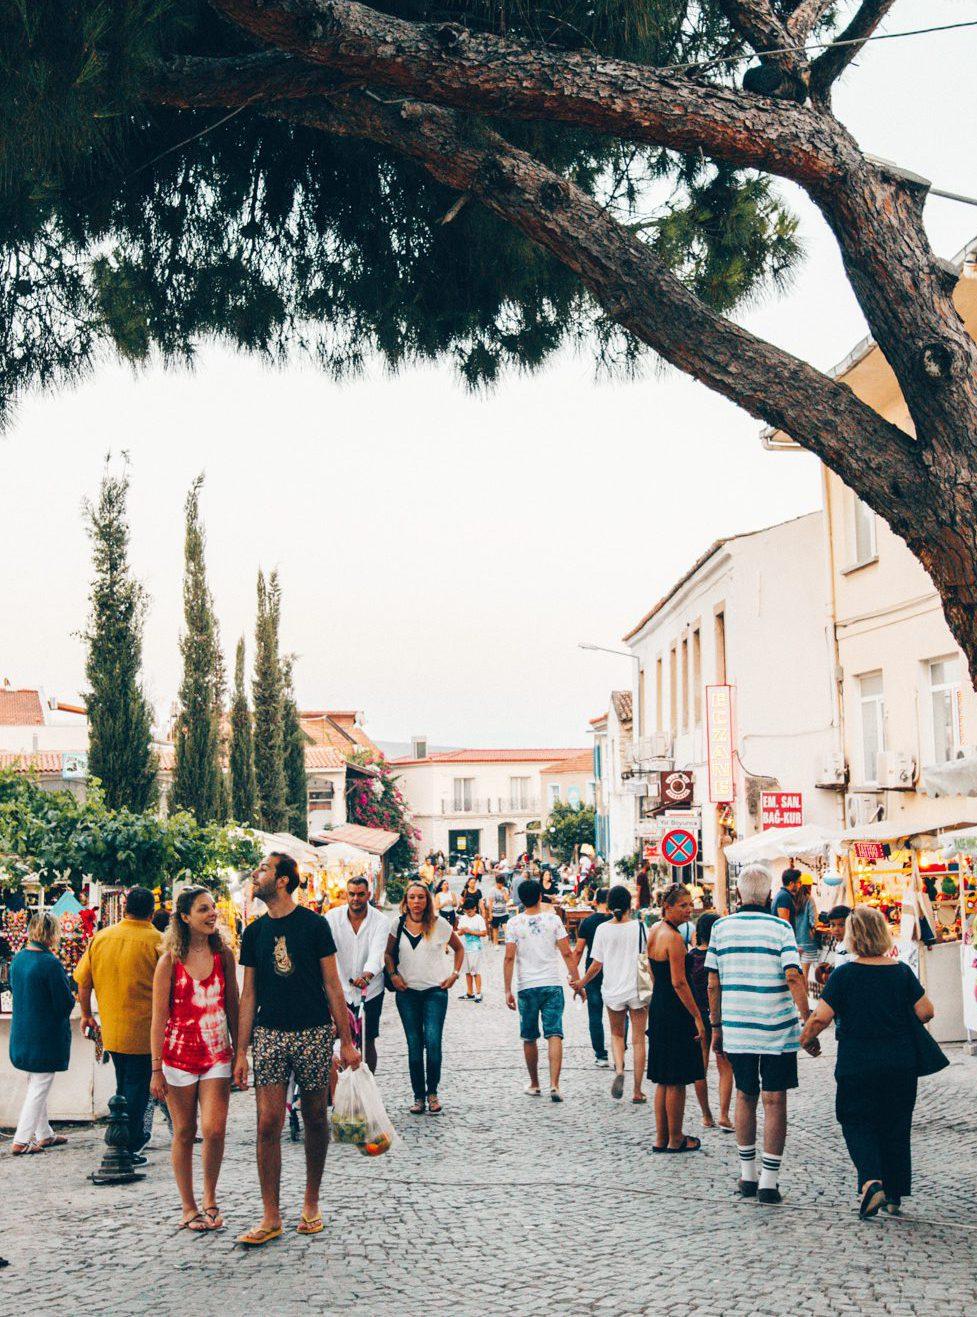 5 Delicious Highlights of Alaçatı, Turkey